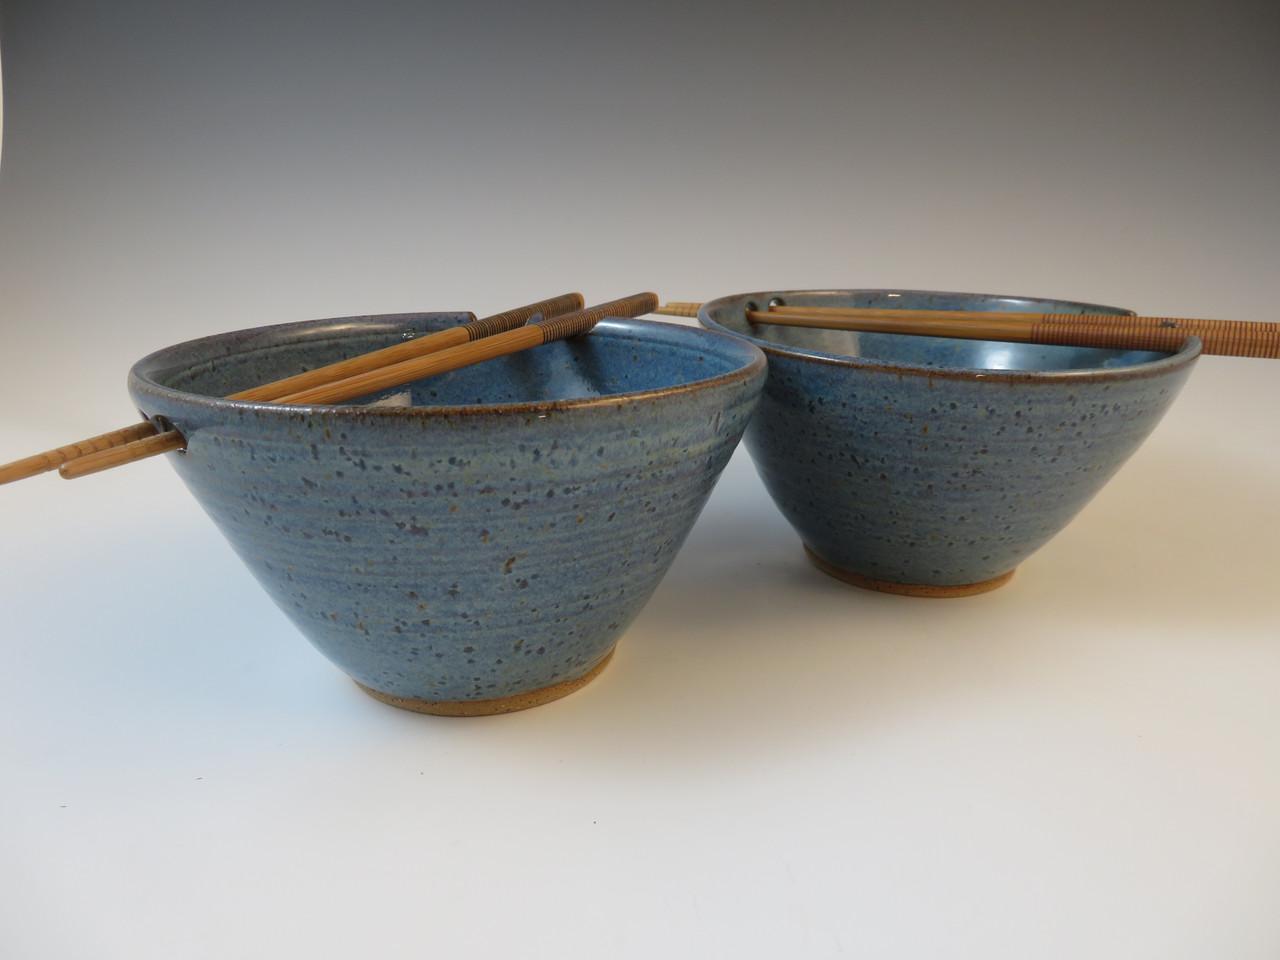 Noodle Bowls in Rustic Blue